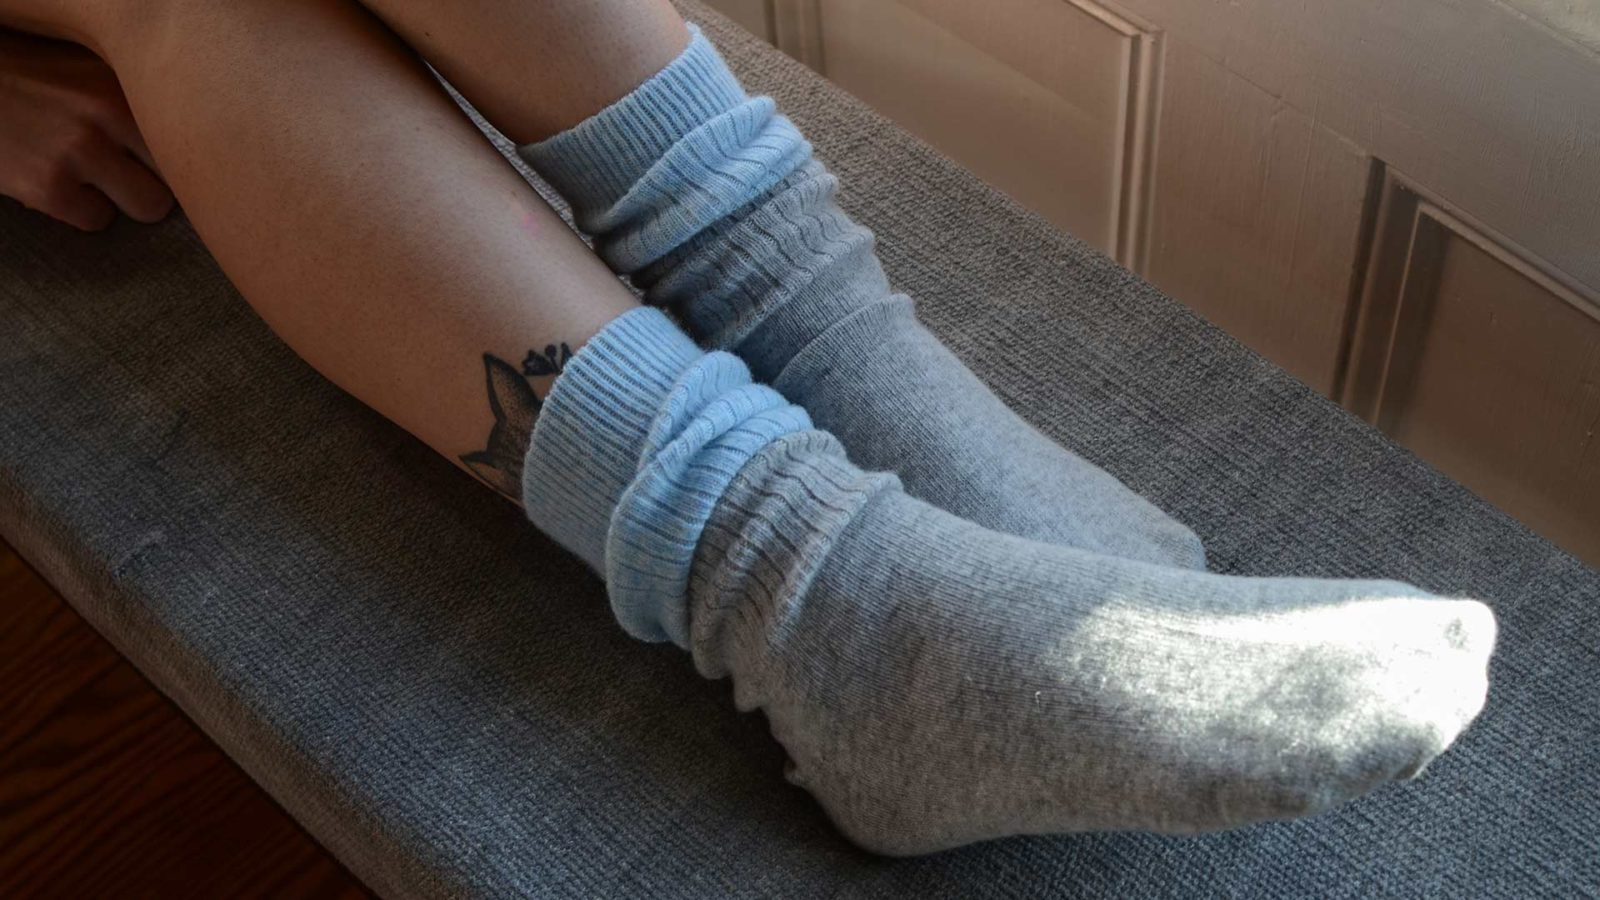 sleep-socks-blue-and-grey